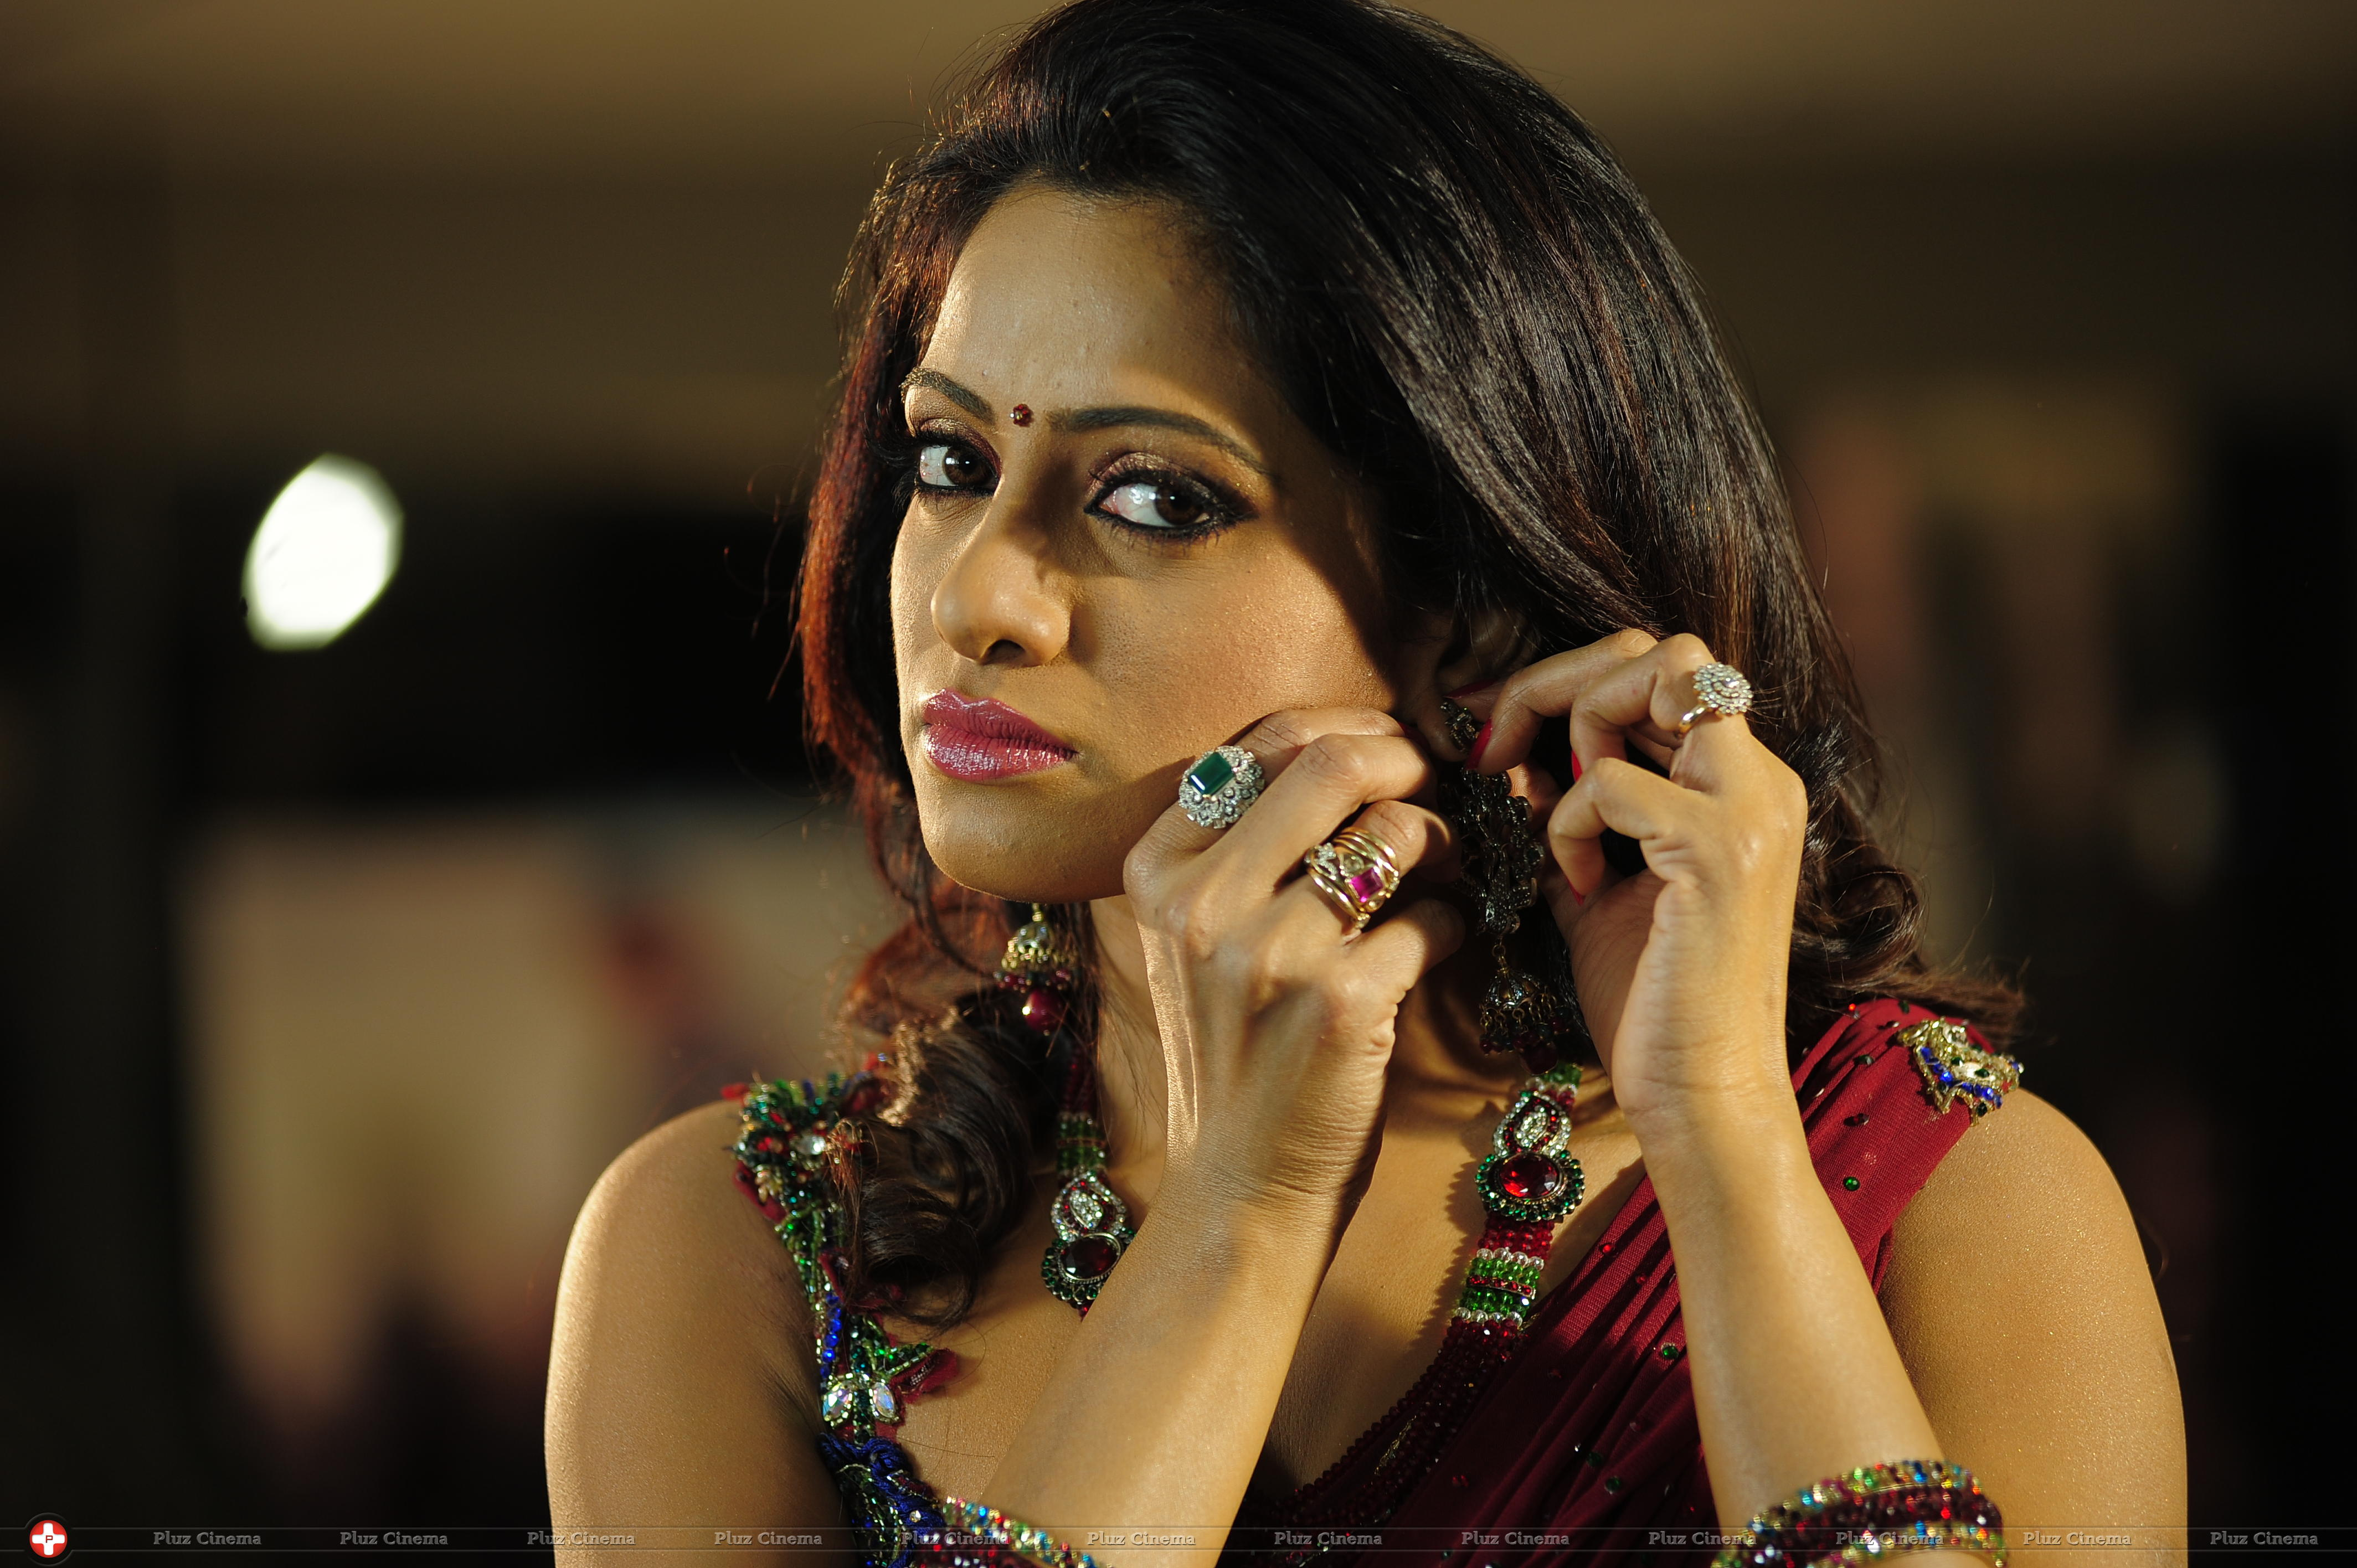 Madhumati_Movie_New_Stills-2013-02-09 16.40.00.jpg-795b081b34adea68bb9c6fa05c947976